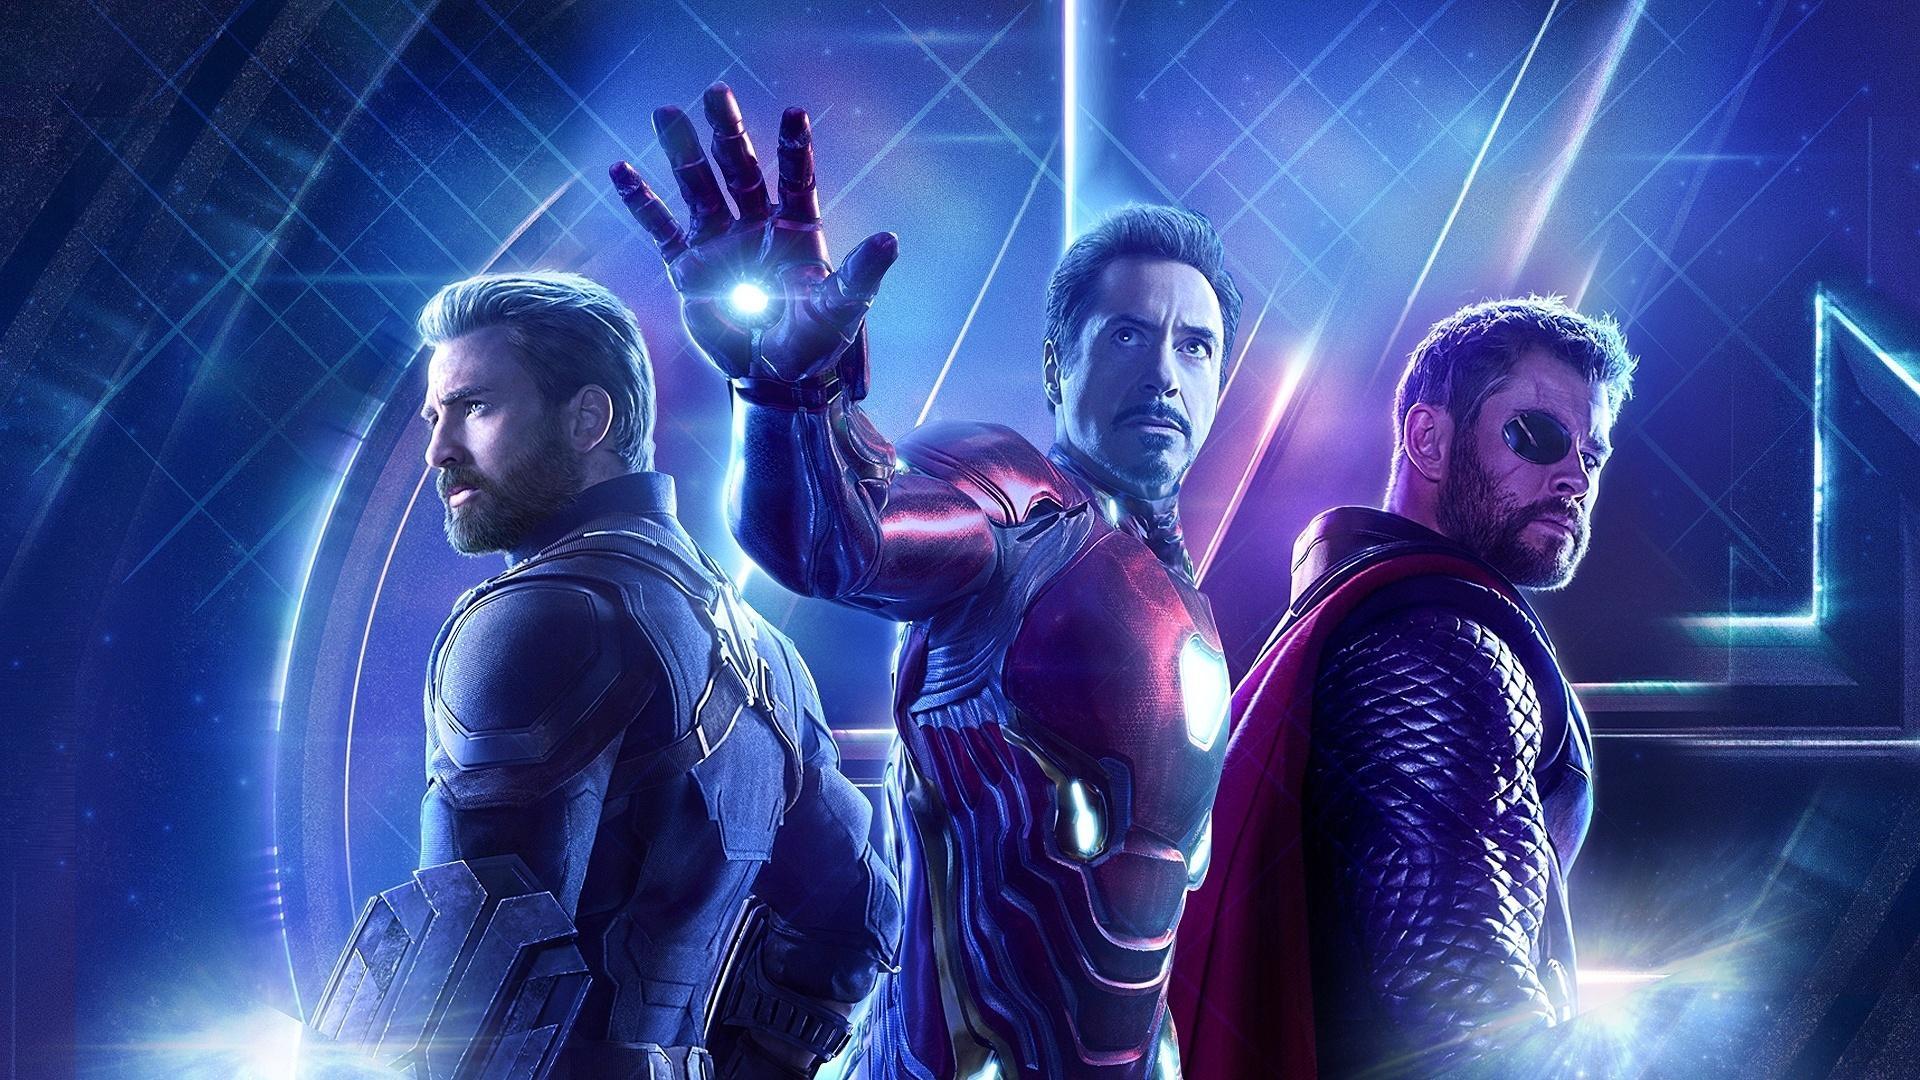 Academia Quer Reunir Os Vingadores No Palco Do Oscar 2019 Diz